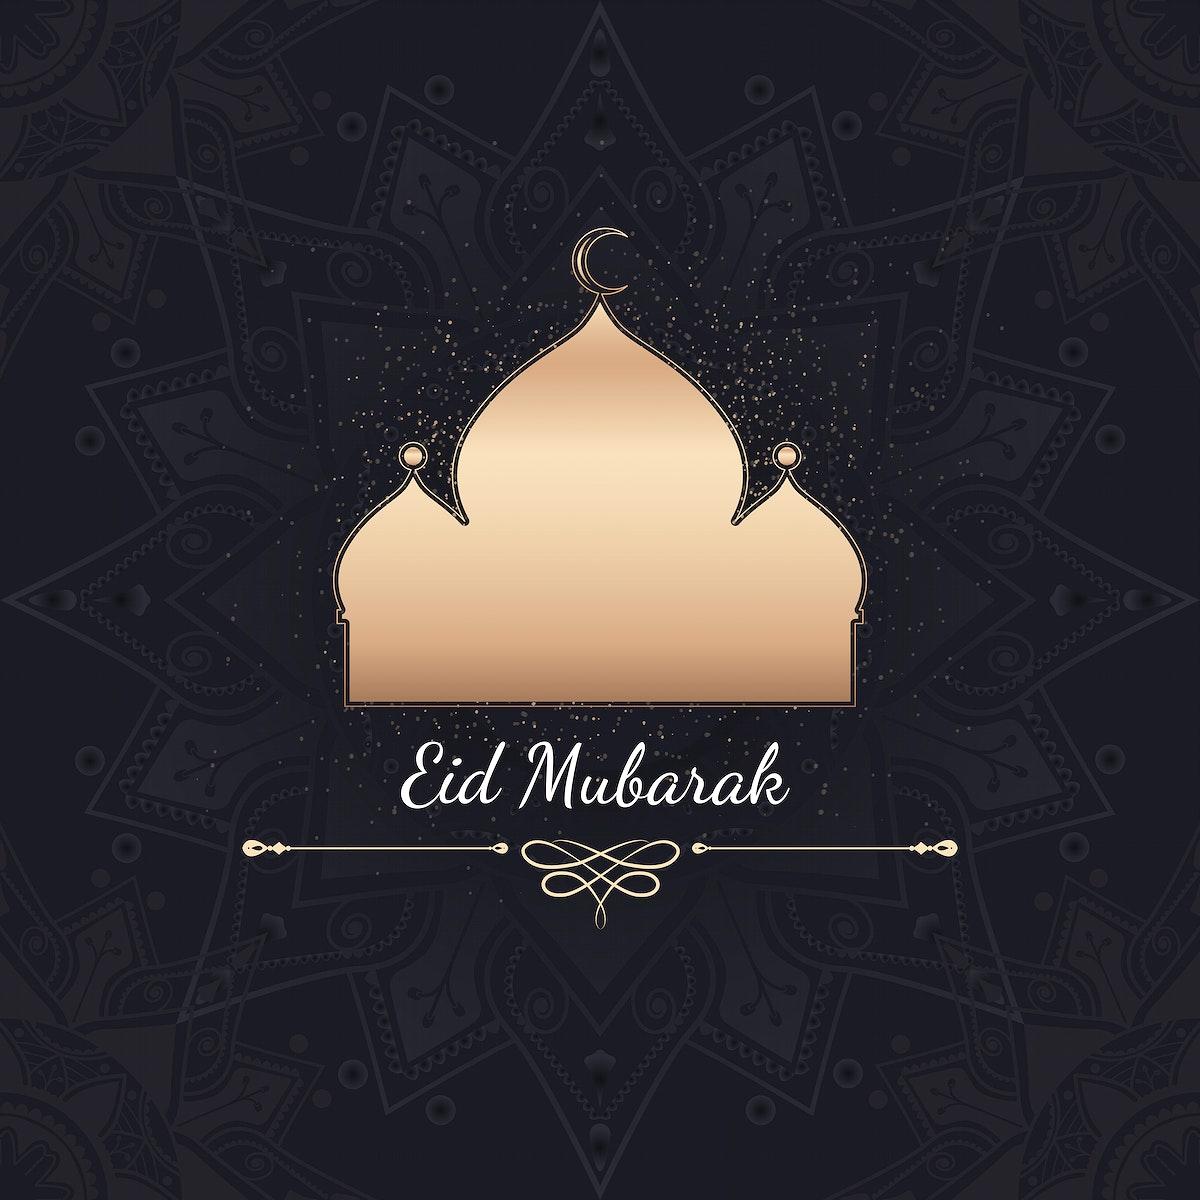 Eid Mubarak card with mosque pattern background